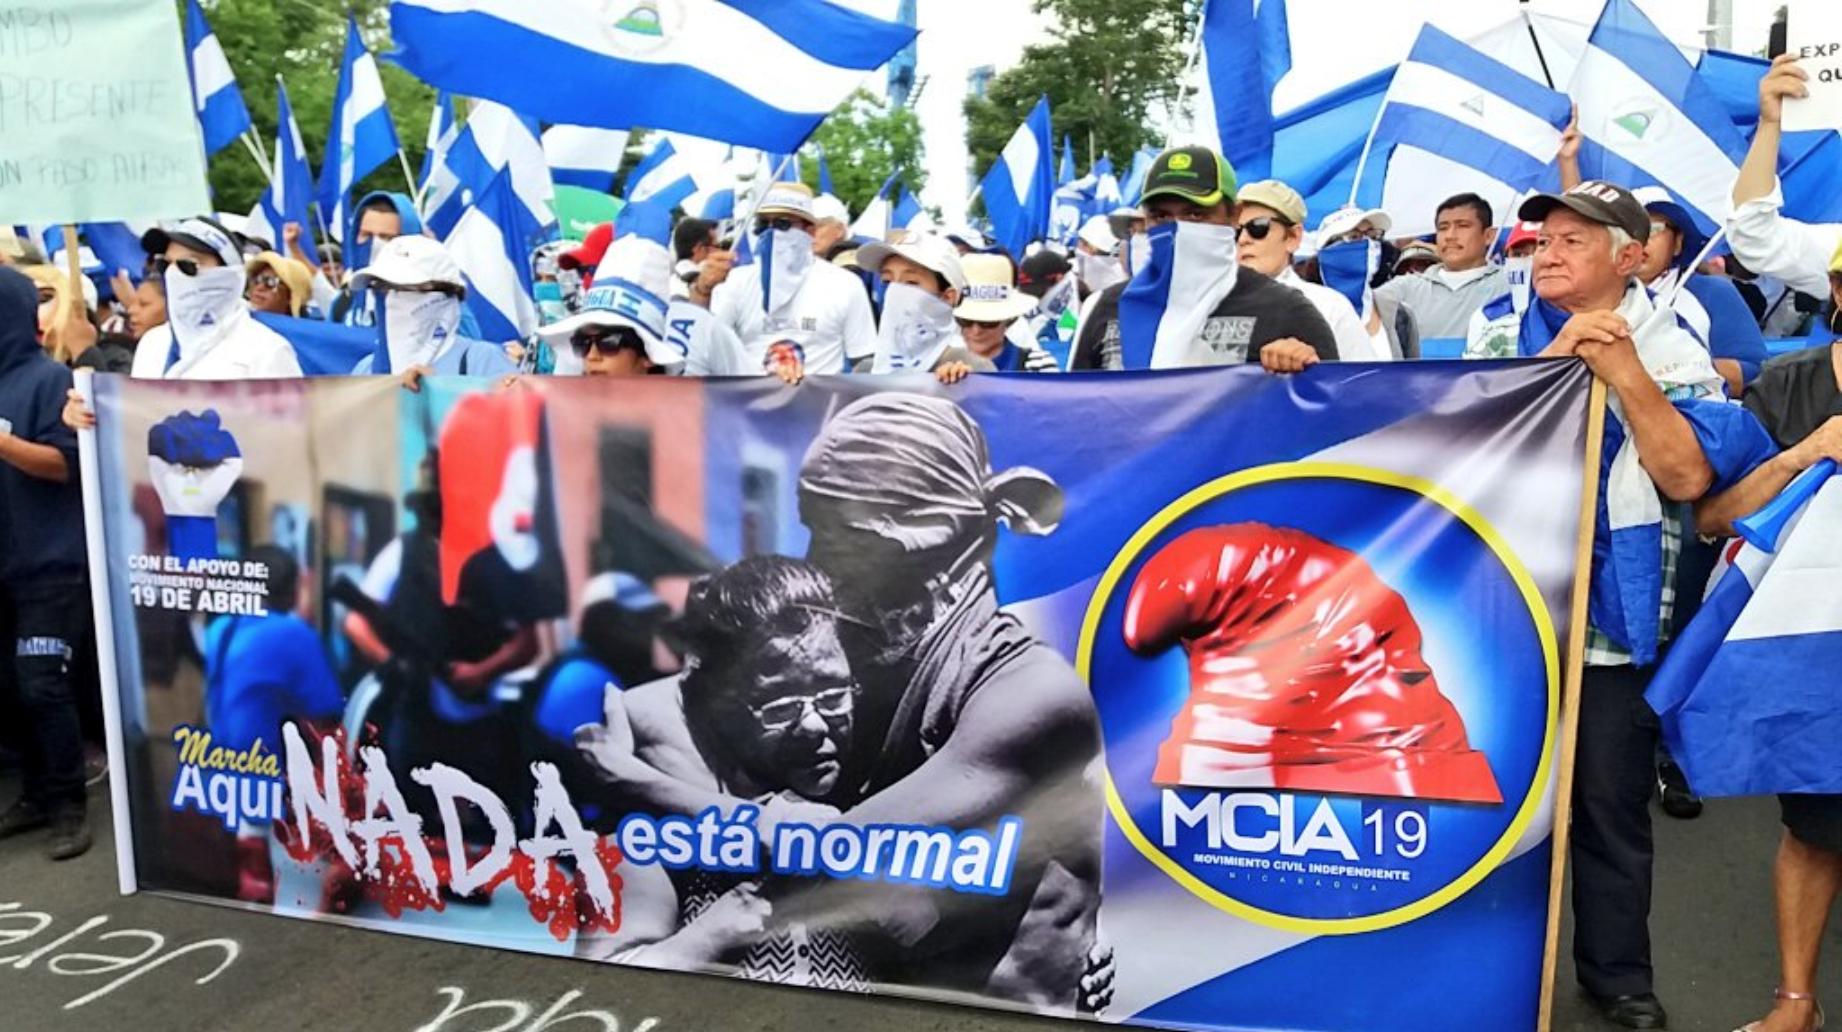 Marchan para desmentir la falsa «normalidad» que pregona la dictadura. Foto: W. Benavides